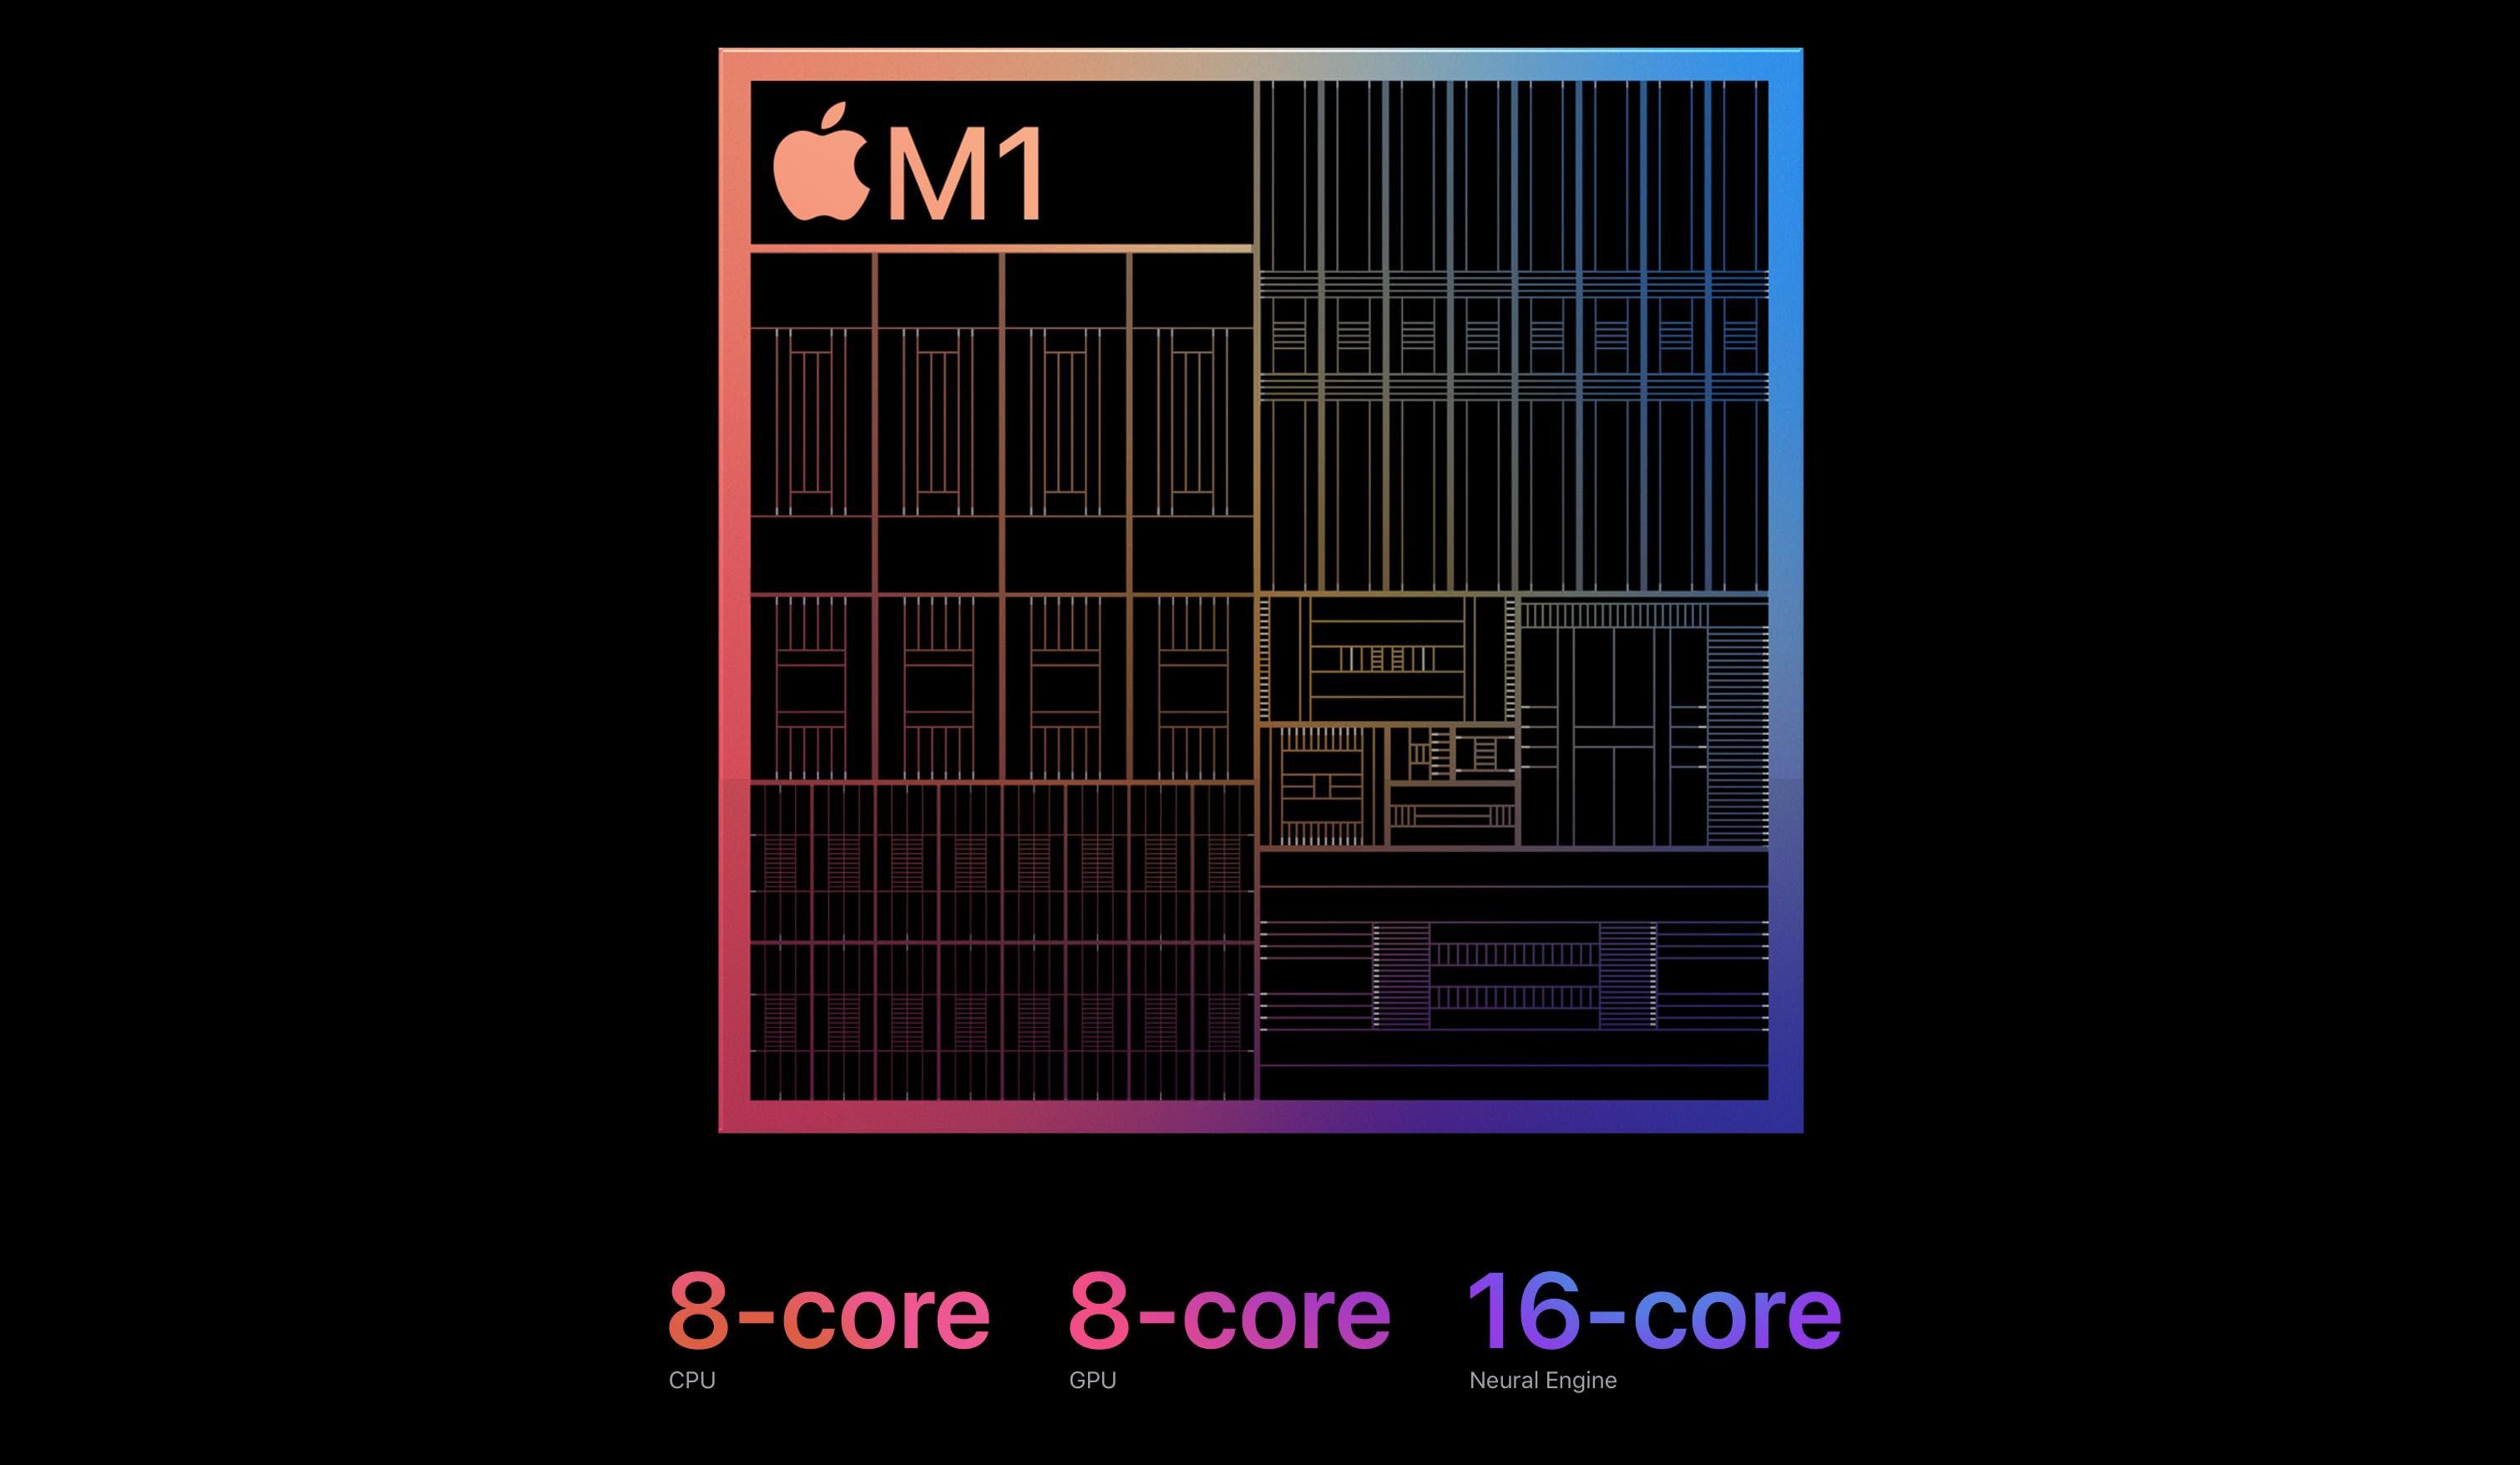 M1 iMac против Intel iMac - ЦП, графический процессор и т. д.